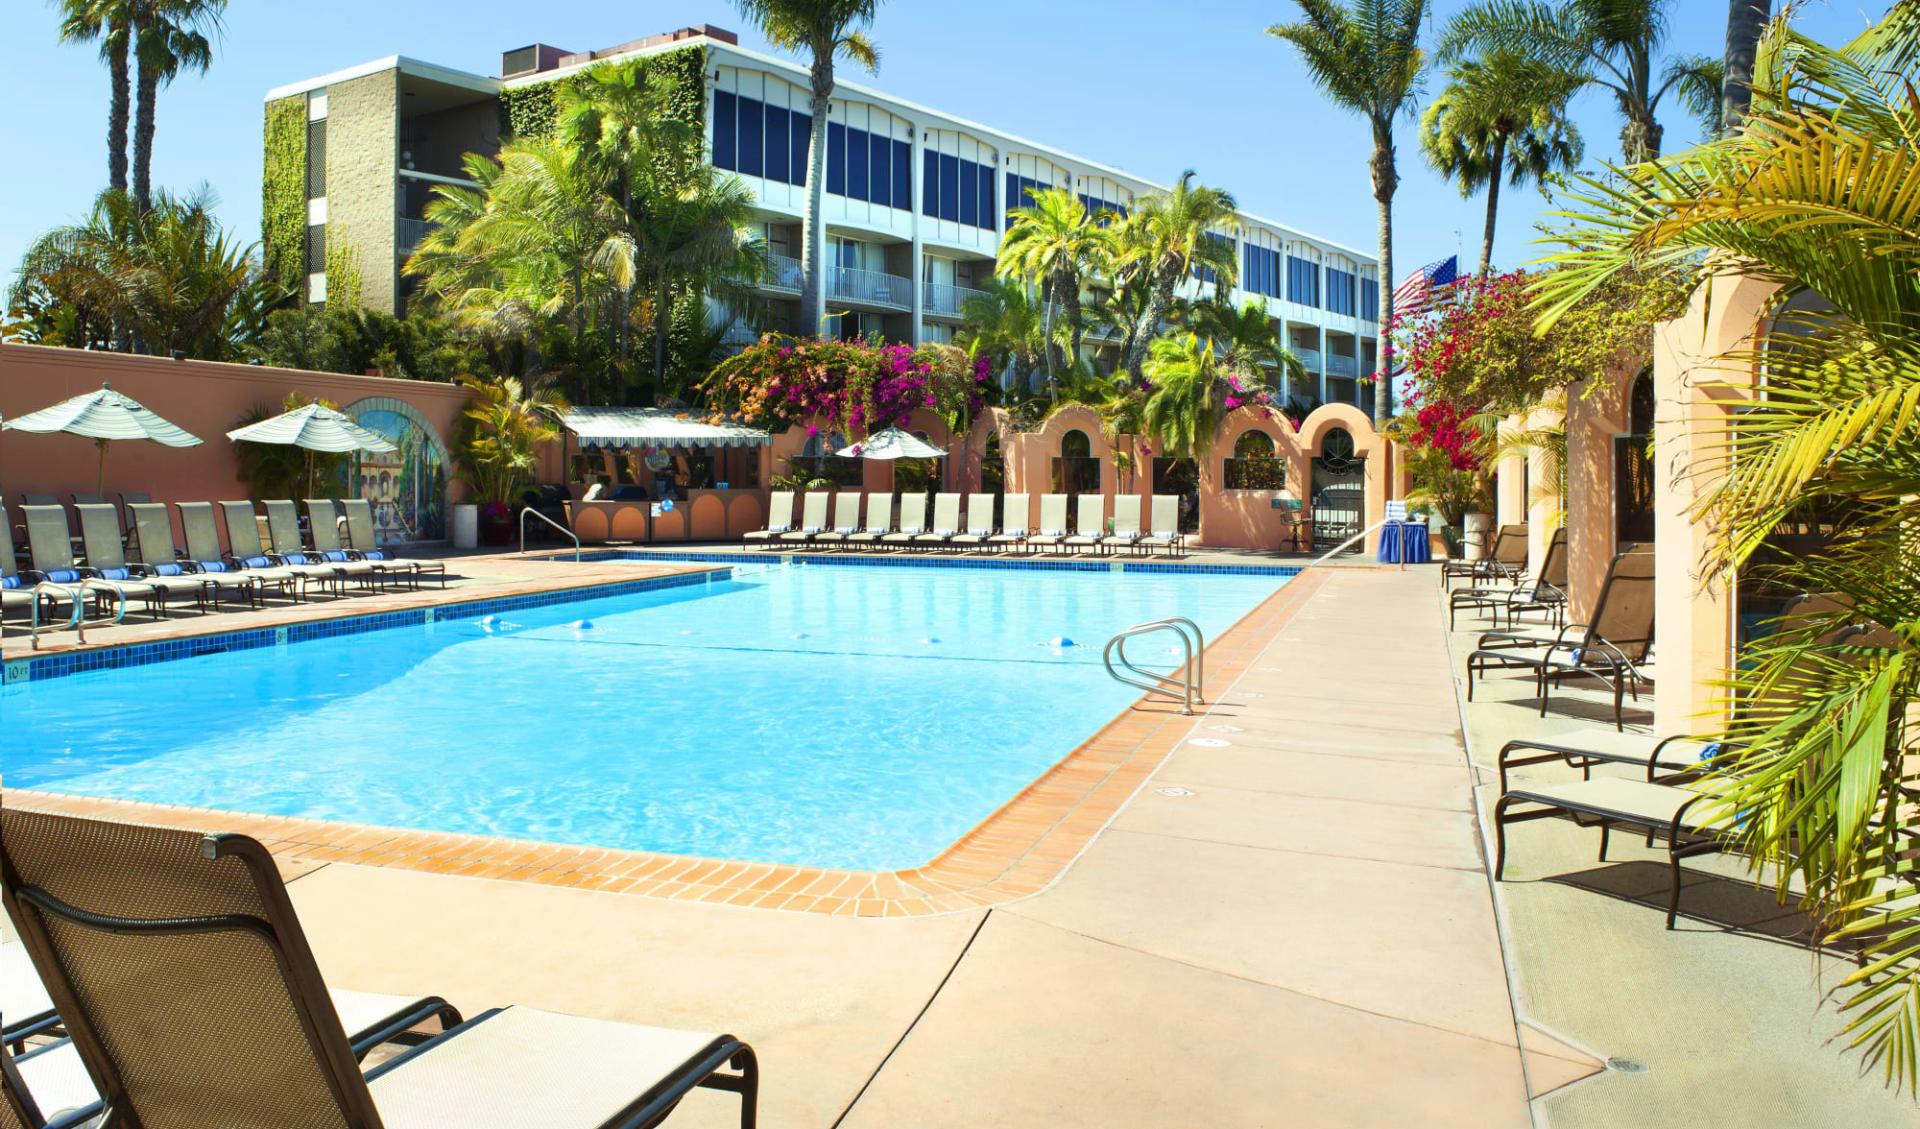 Bahia Resort Hotel in San Diego: Exterior_Bahia Resort_Aussenpool_ATI